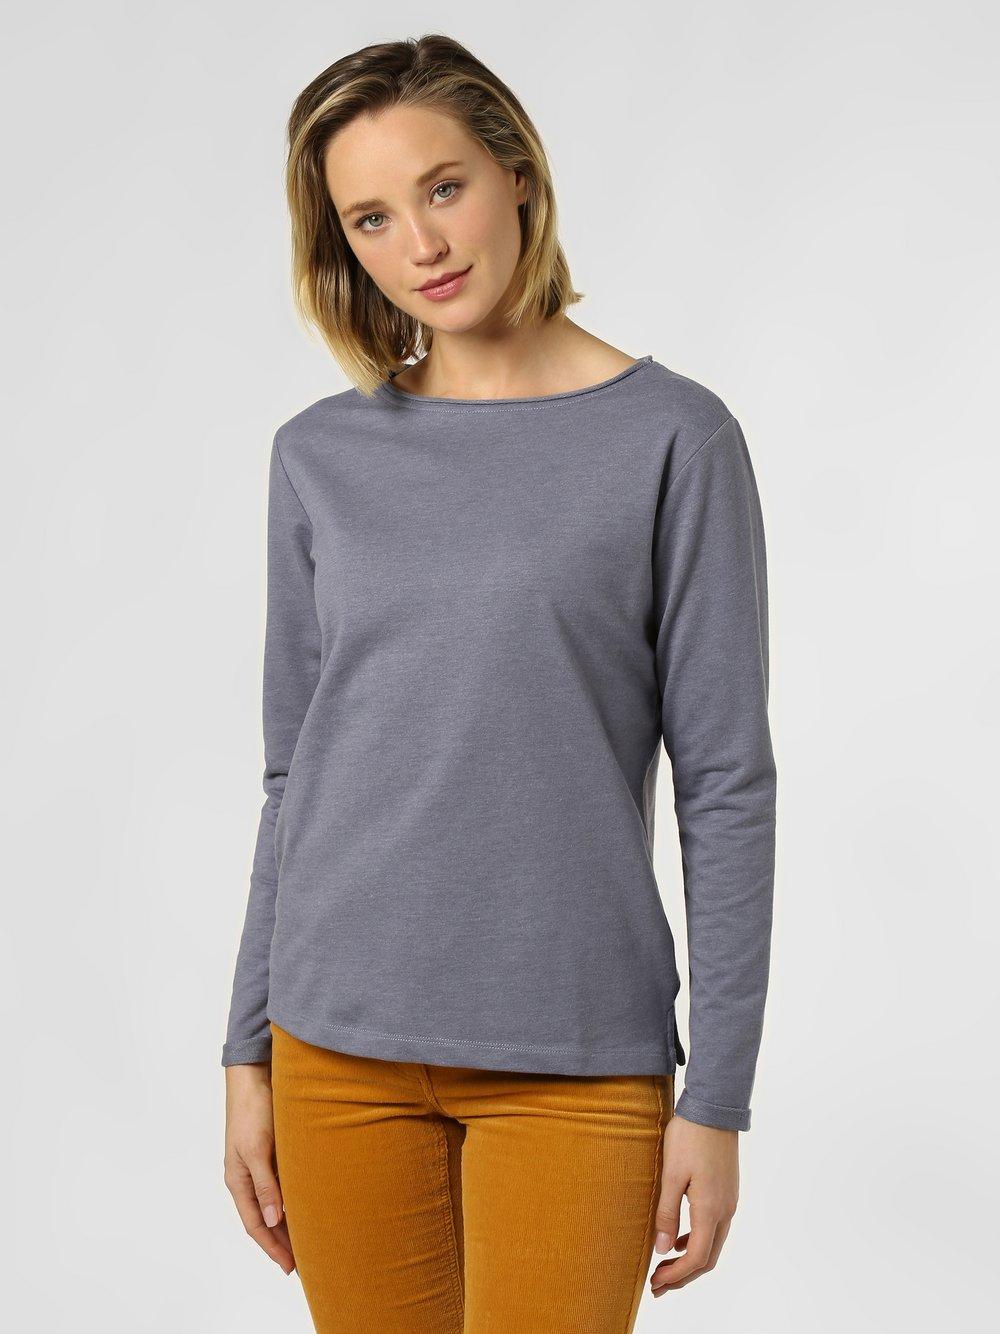 Marie Lund - Damska bluza nierozpinana, szary